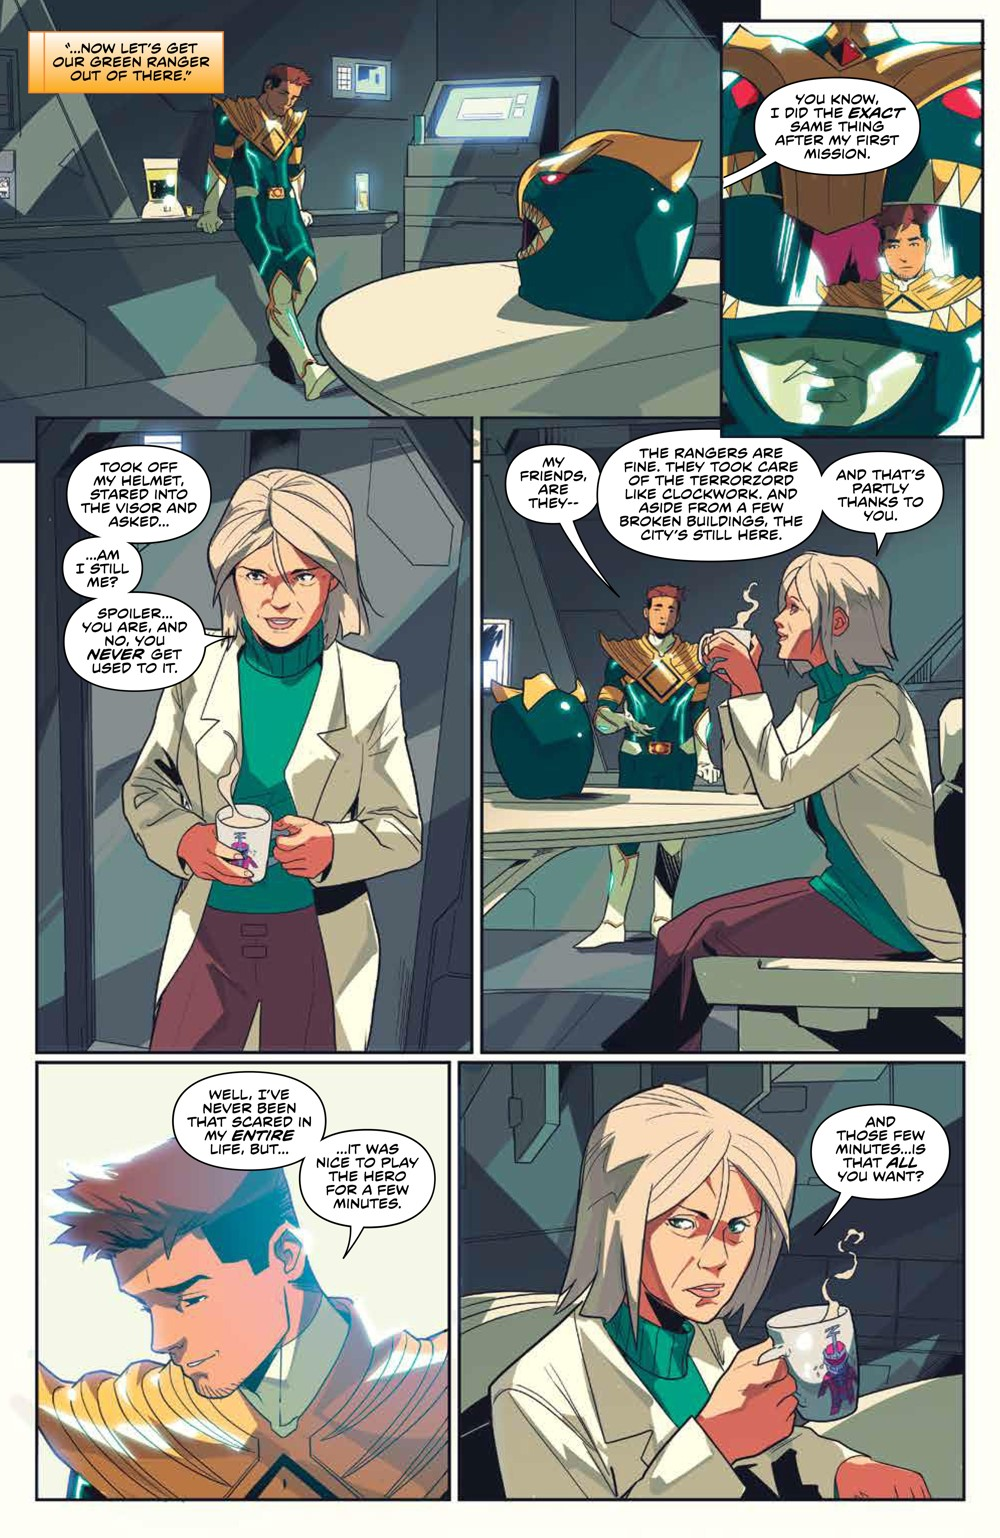 MightyMorphin_v2_SC_PRESS_13 ComicList Previews: MIGHTY MORPHIN VOLUME 2 TP